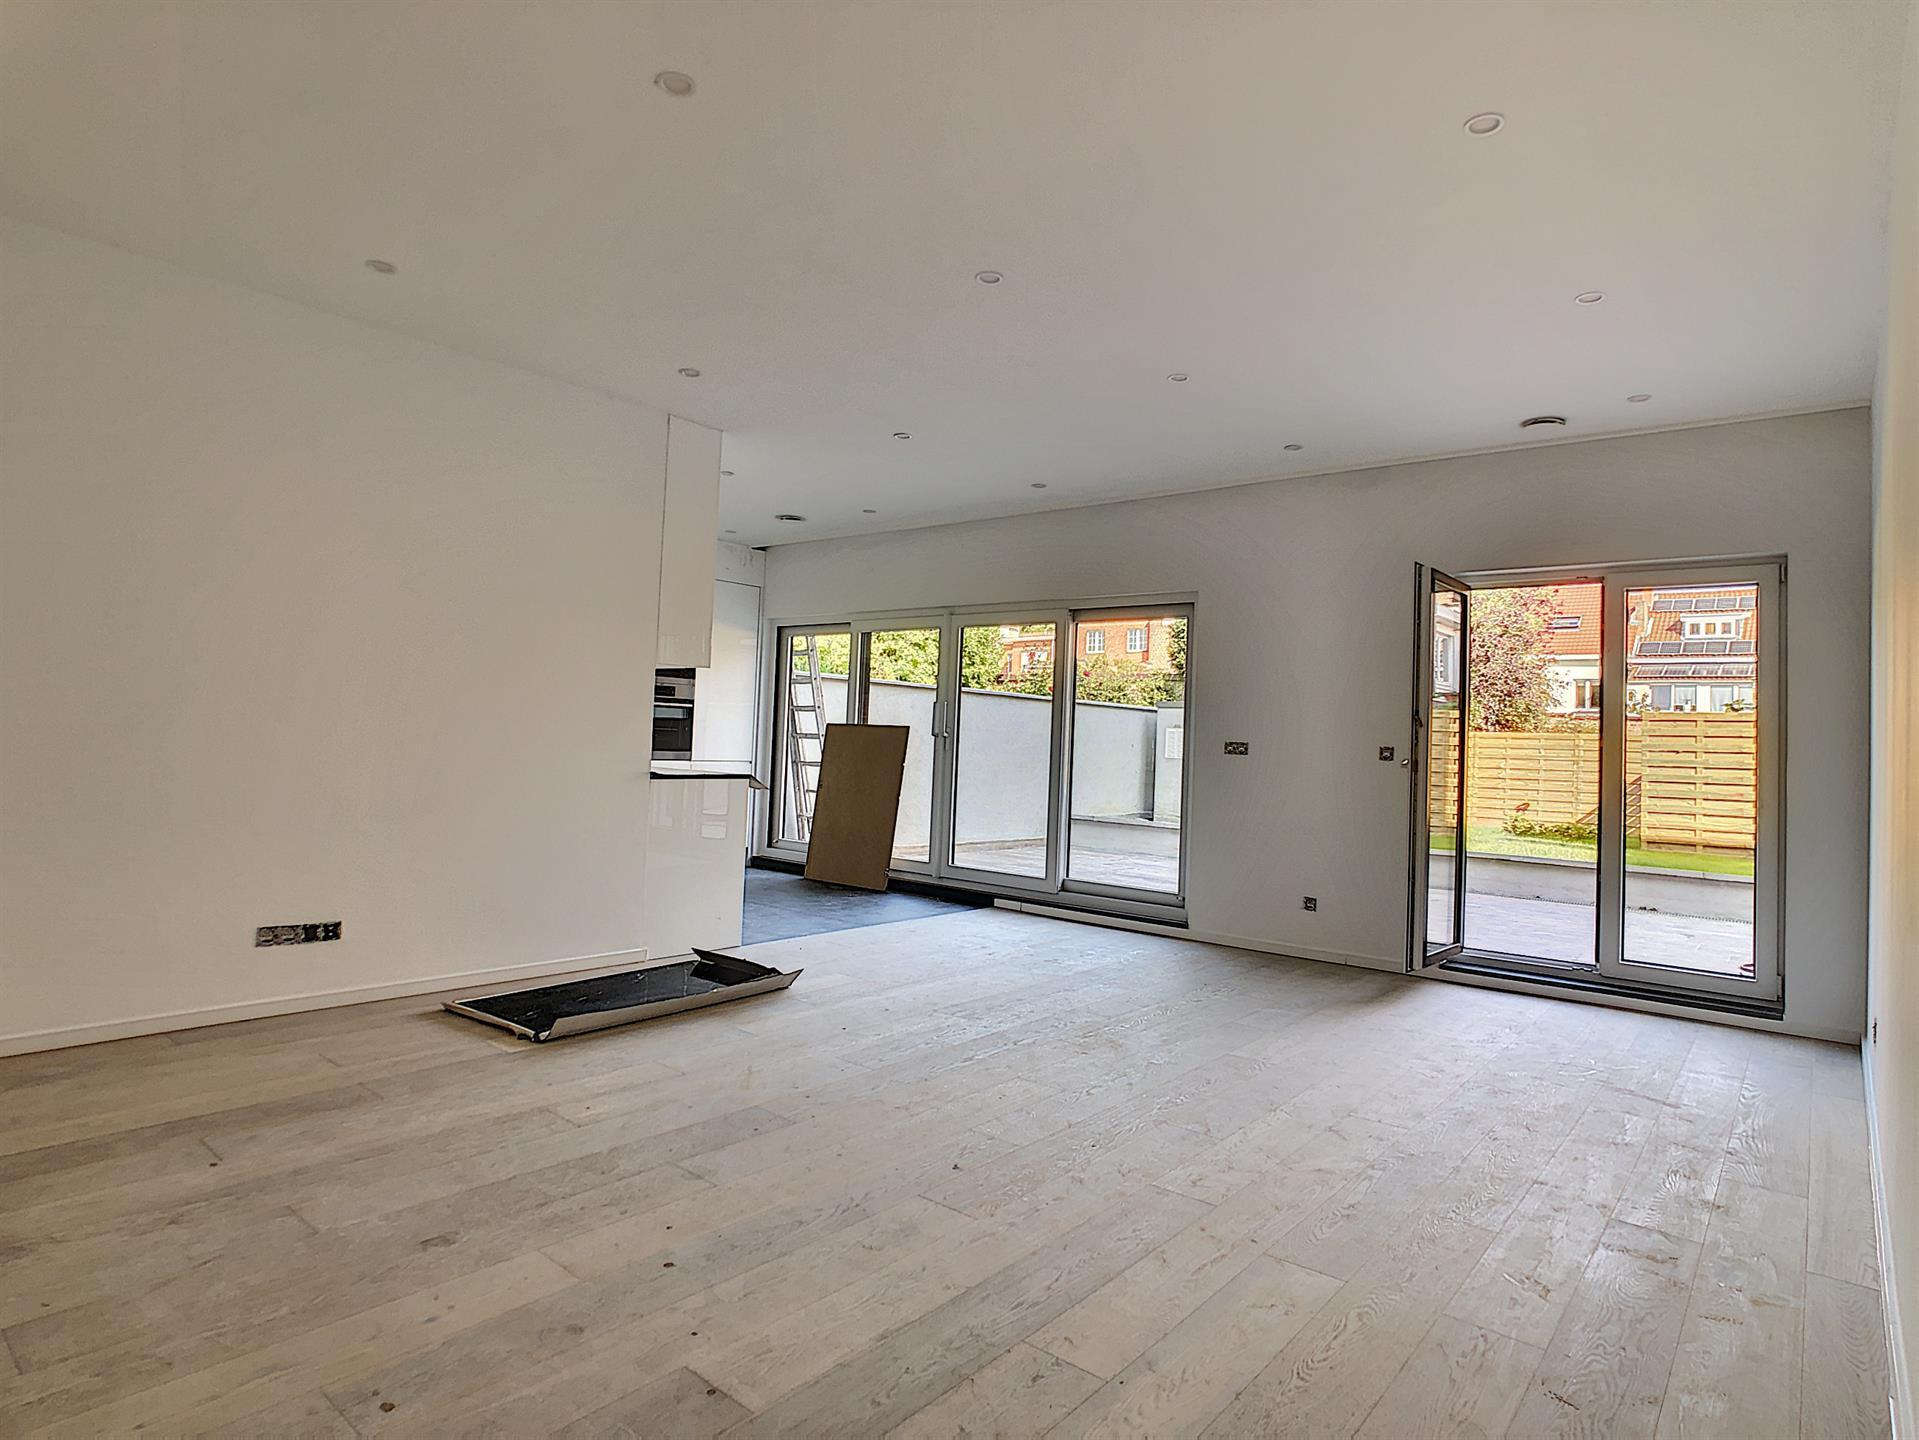 Appartement - Anderlecht - #4252388-17